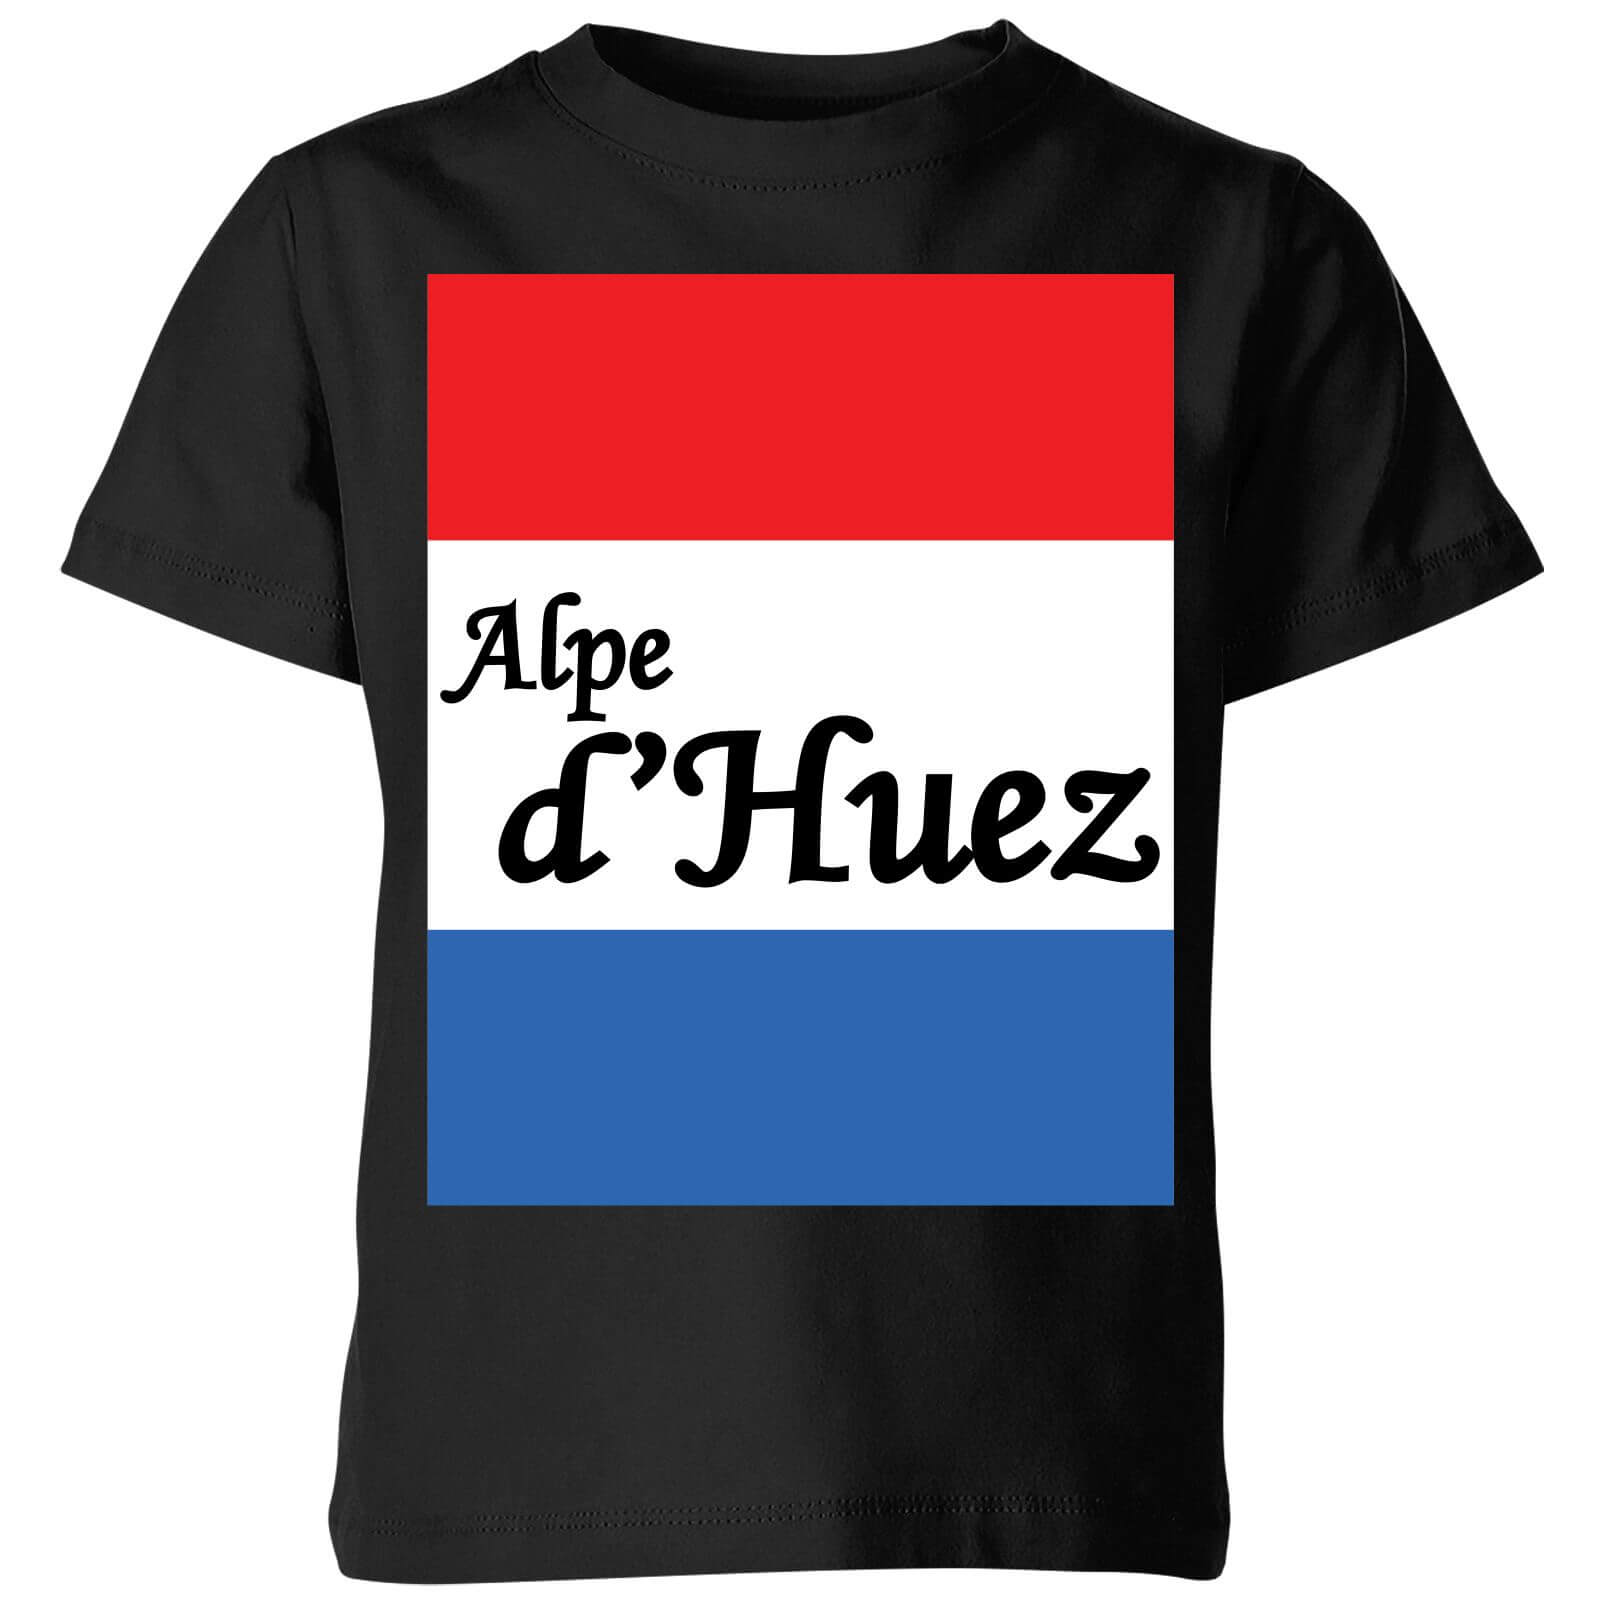 Summit Finish Alpe Dhuez Kids T-shirt - Black - 5-6 Years - Black